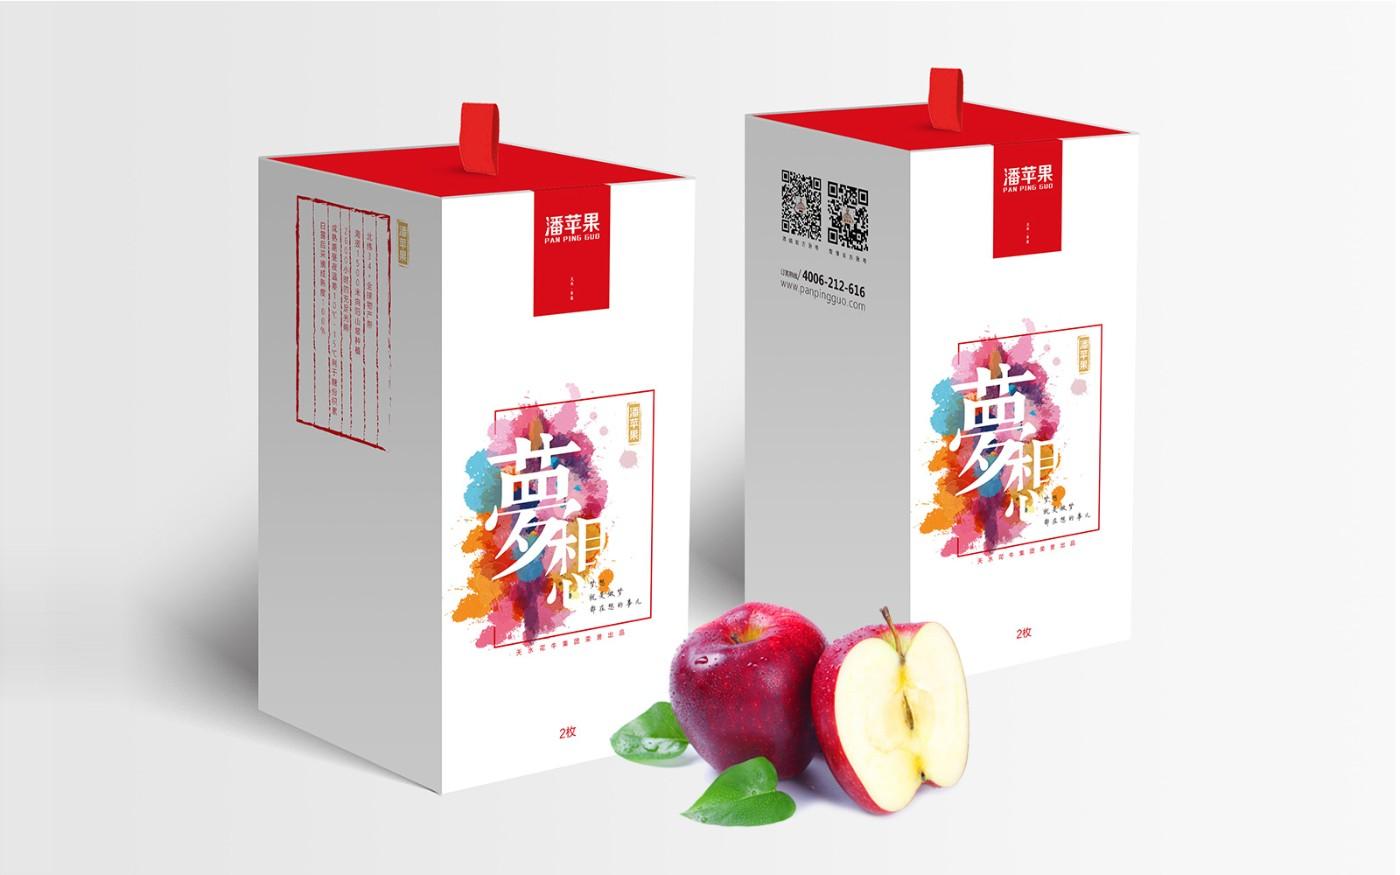 潘苹果<a href='http://www.6chuangyi.com/' title='' style='color:;font-weight:bold'>品牌策划</a>05.jpg